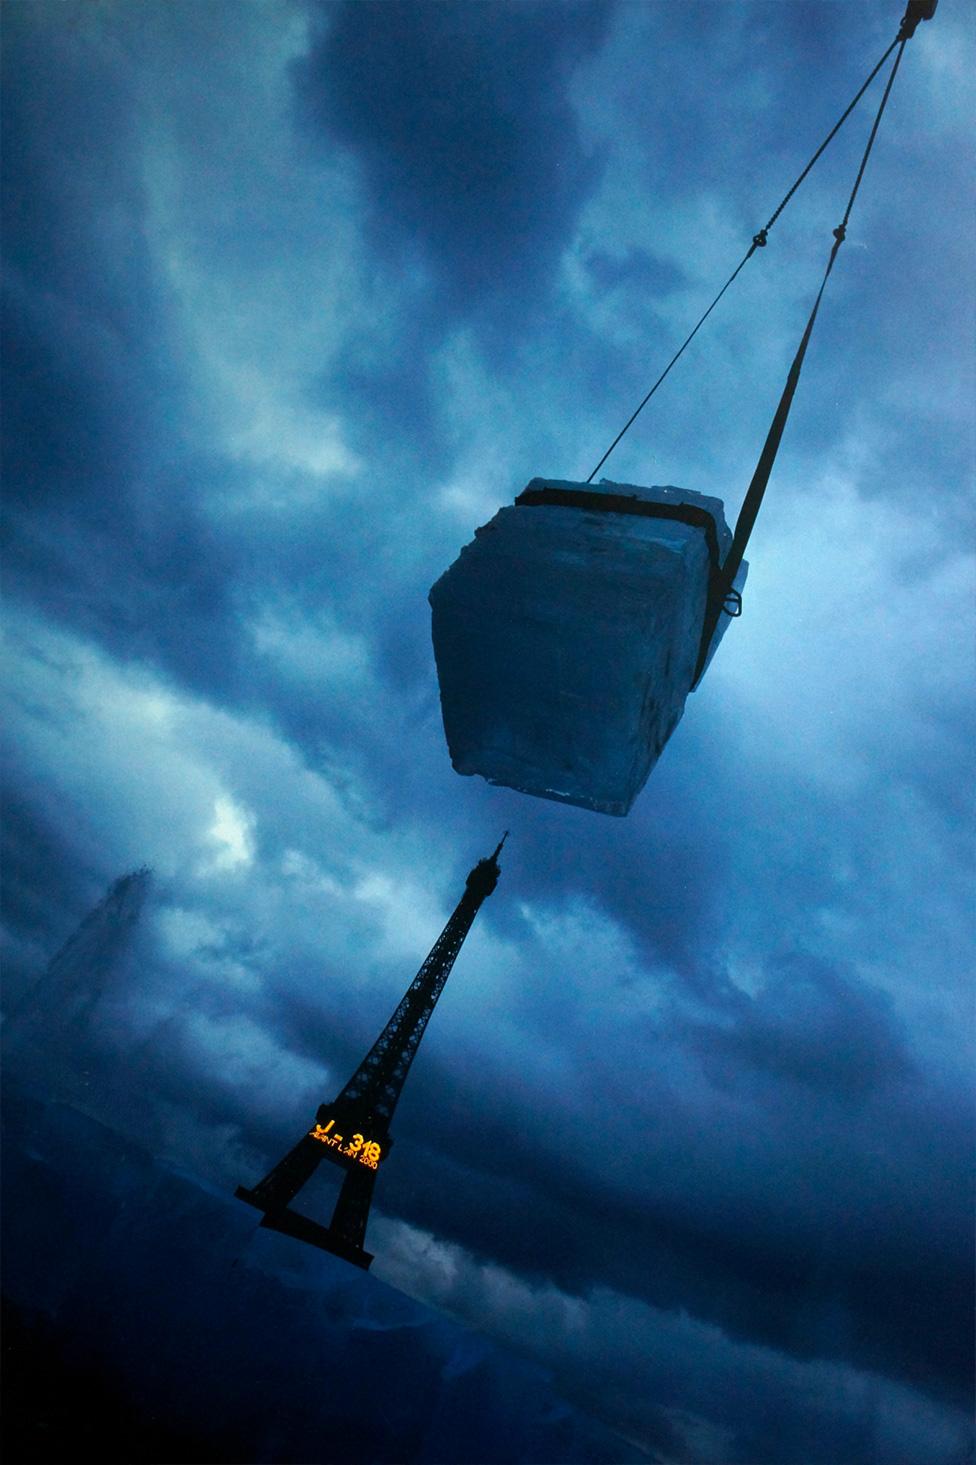 Tour-Eiffel-2000-Lubliner-Art-J-318